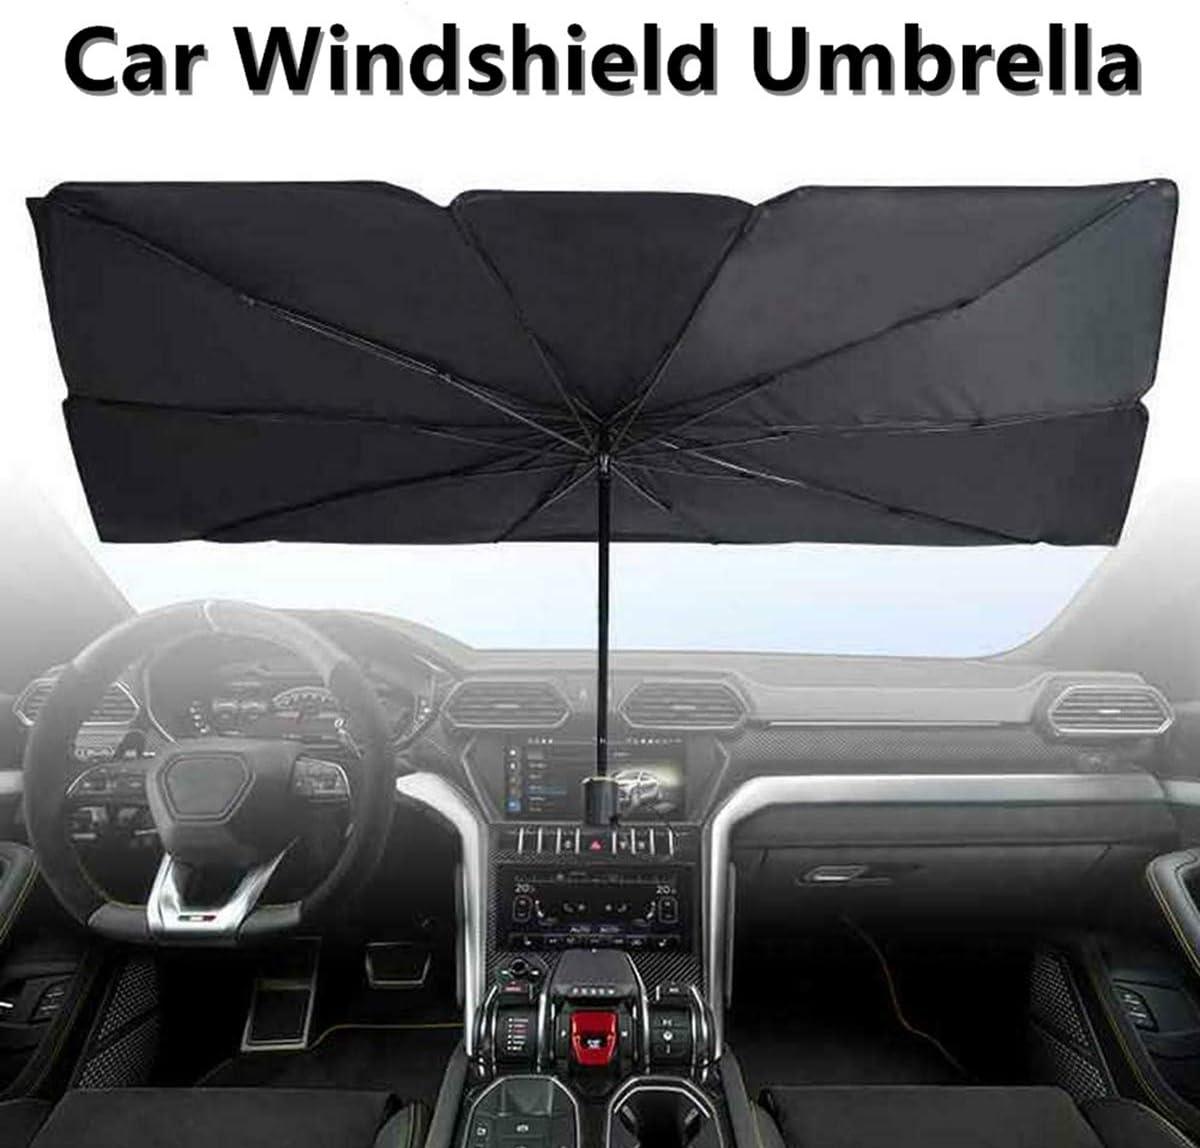 57 x 31 Large Size Car Windshield Sun Shade Umbrella Foldable Car Front Windshield Sunshade Window Cover UV Rays and Heat Sun Visor Protector Black